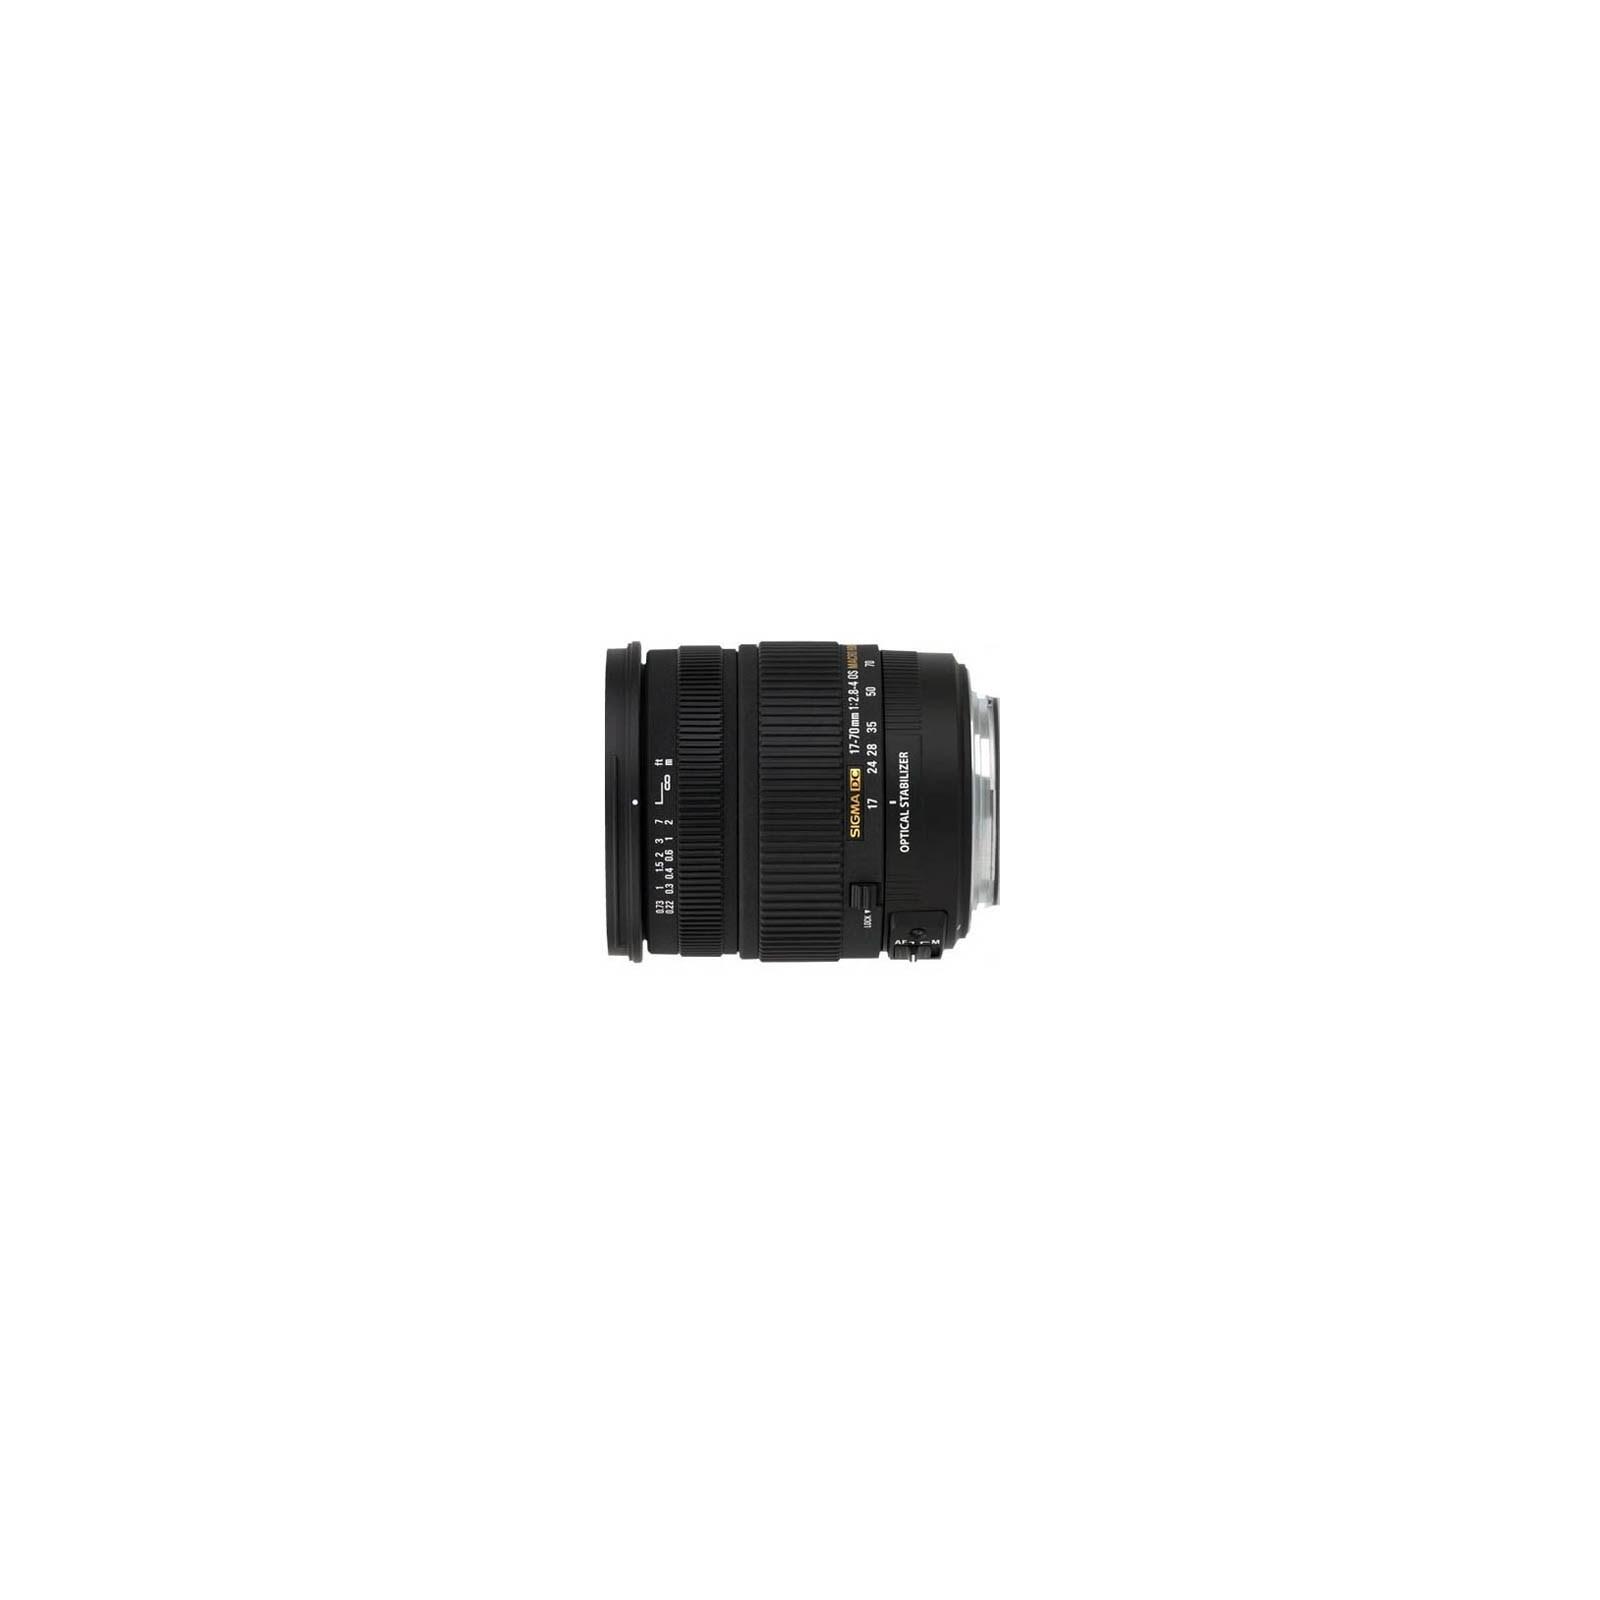 Объектив Sigma 17-70mm f/2.8-4 DC macro OS for Canon (668954)